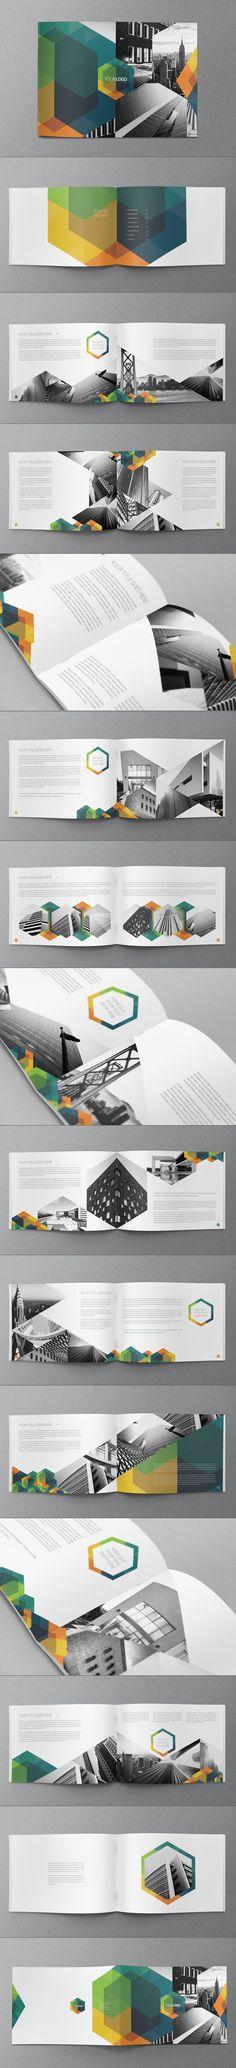 graphic design, brochure layout, color palettes, color schemes, brochur design, brochure design, layout design, design styles, hexo brochur